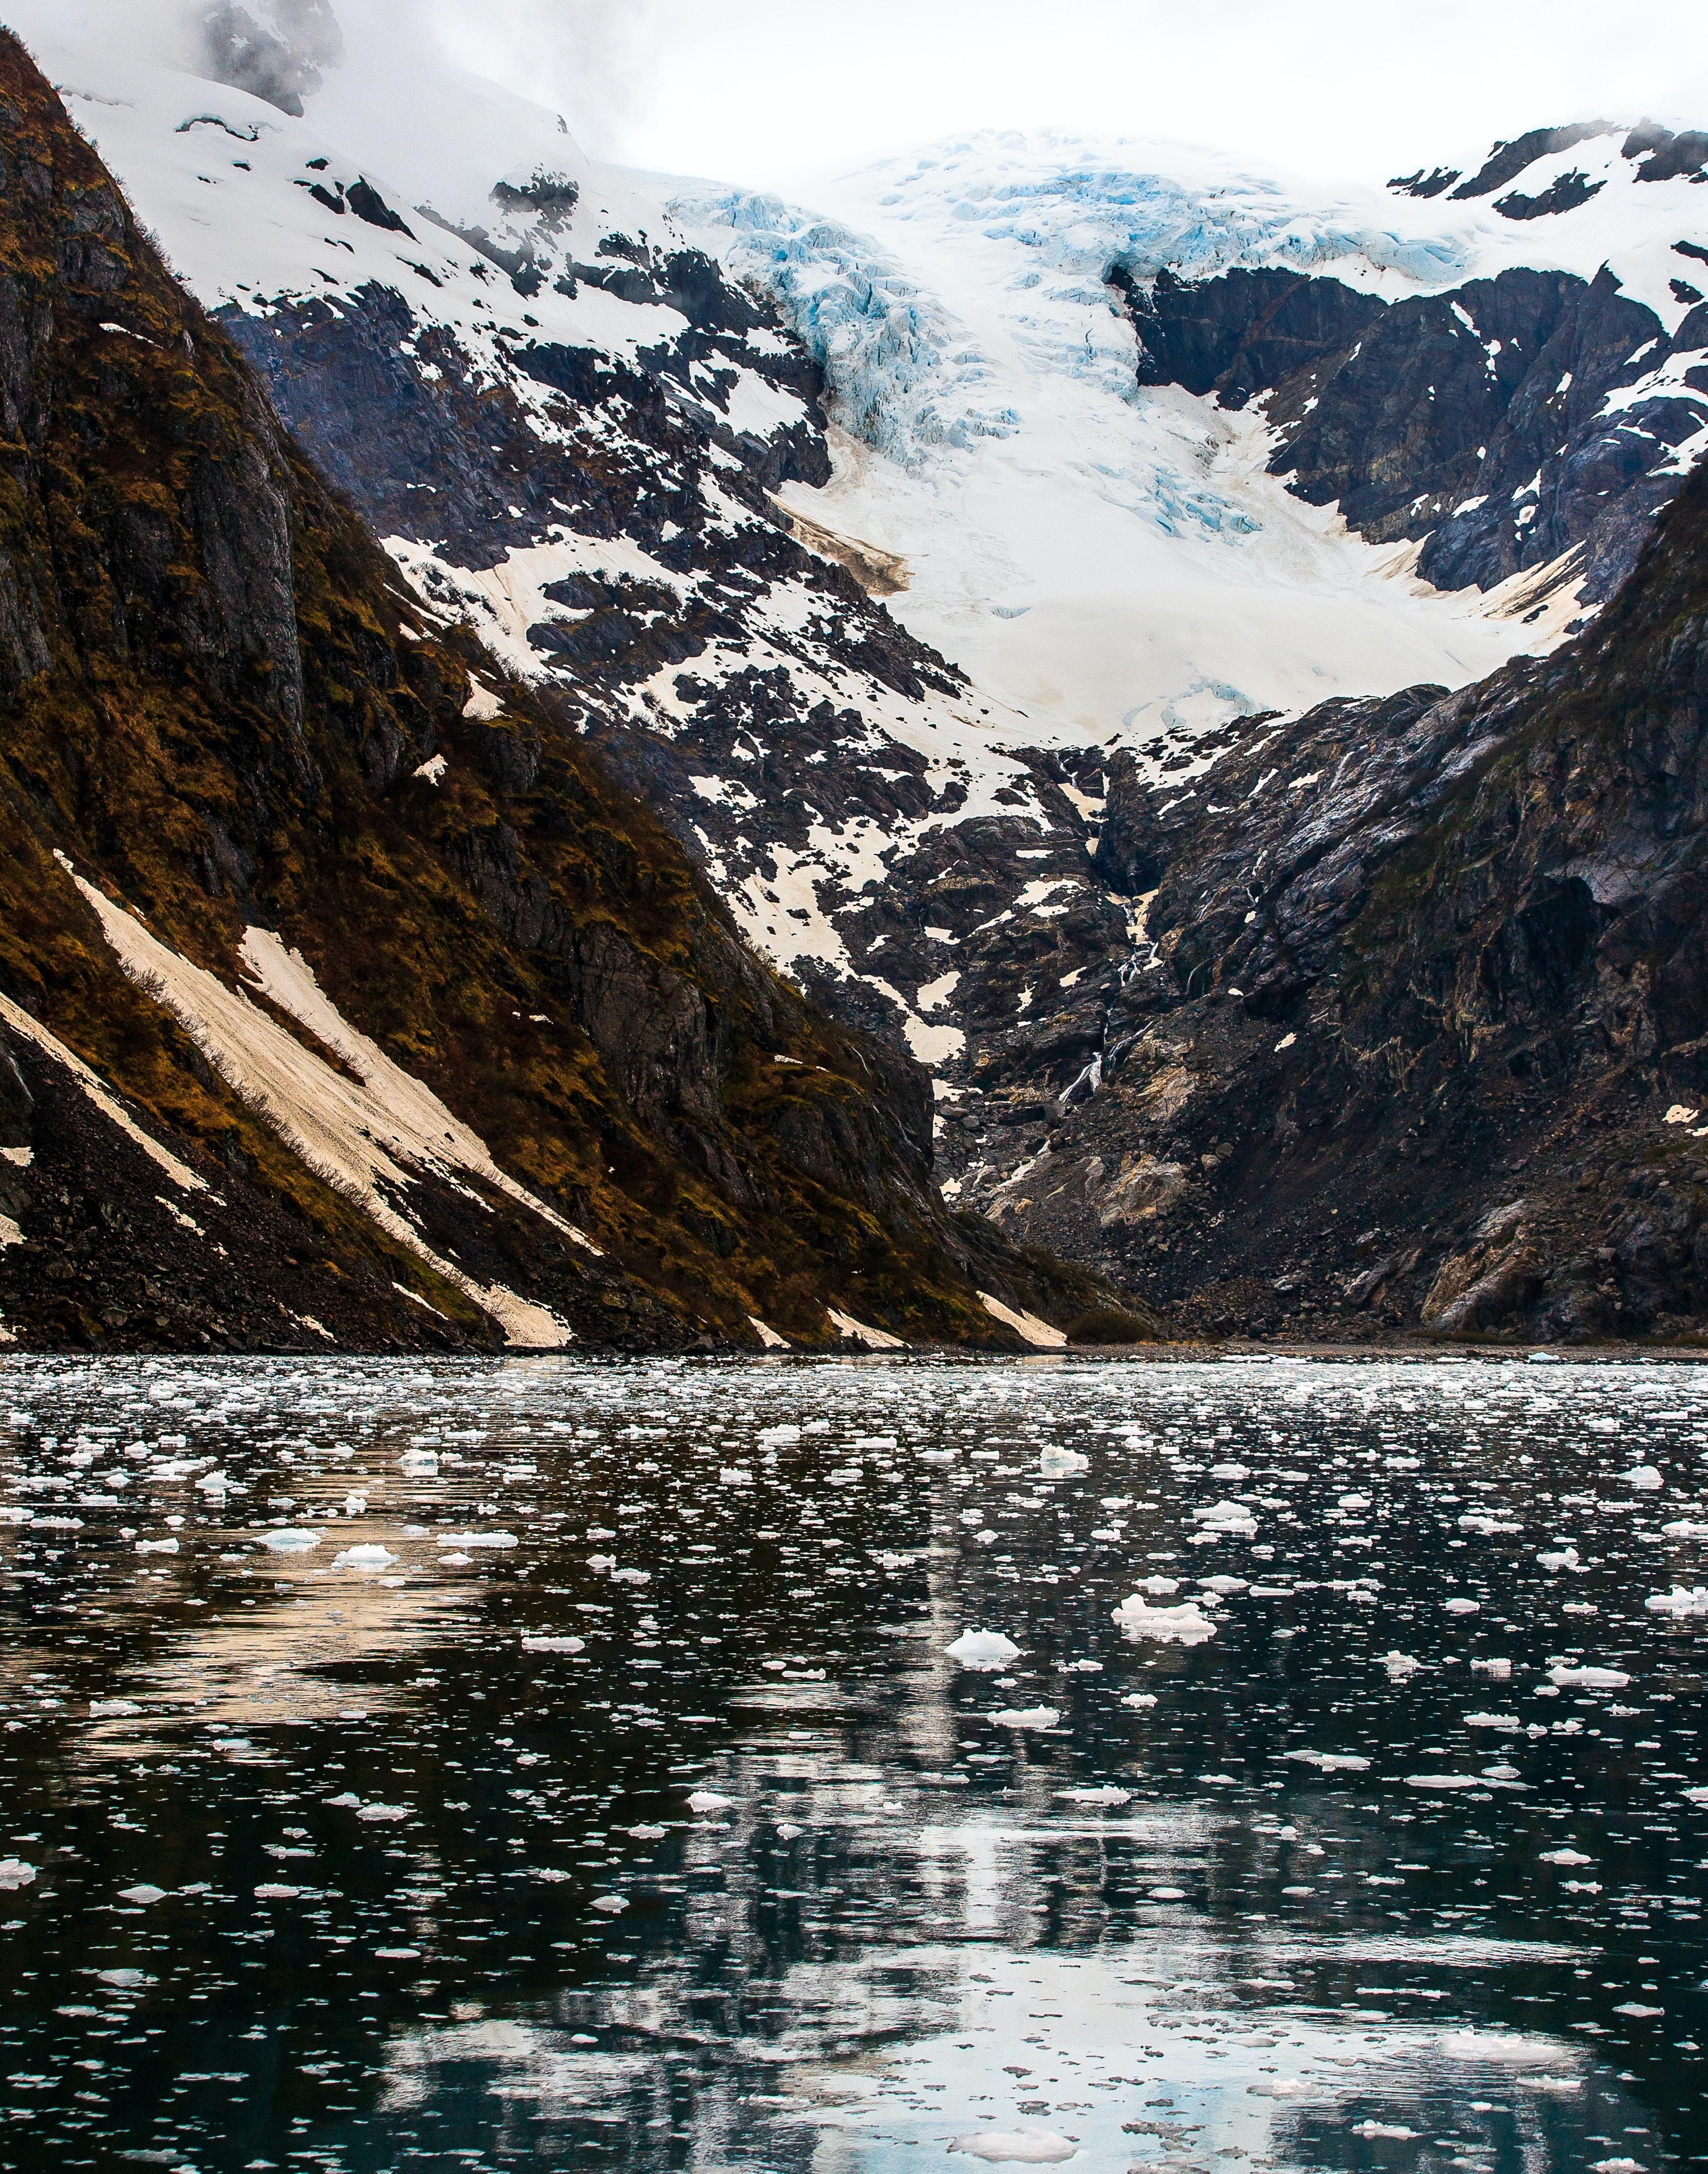 calm lake near glacier mountain at daytime